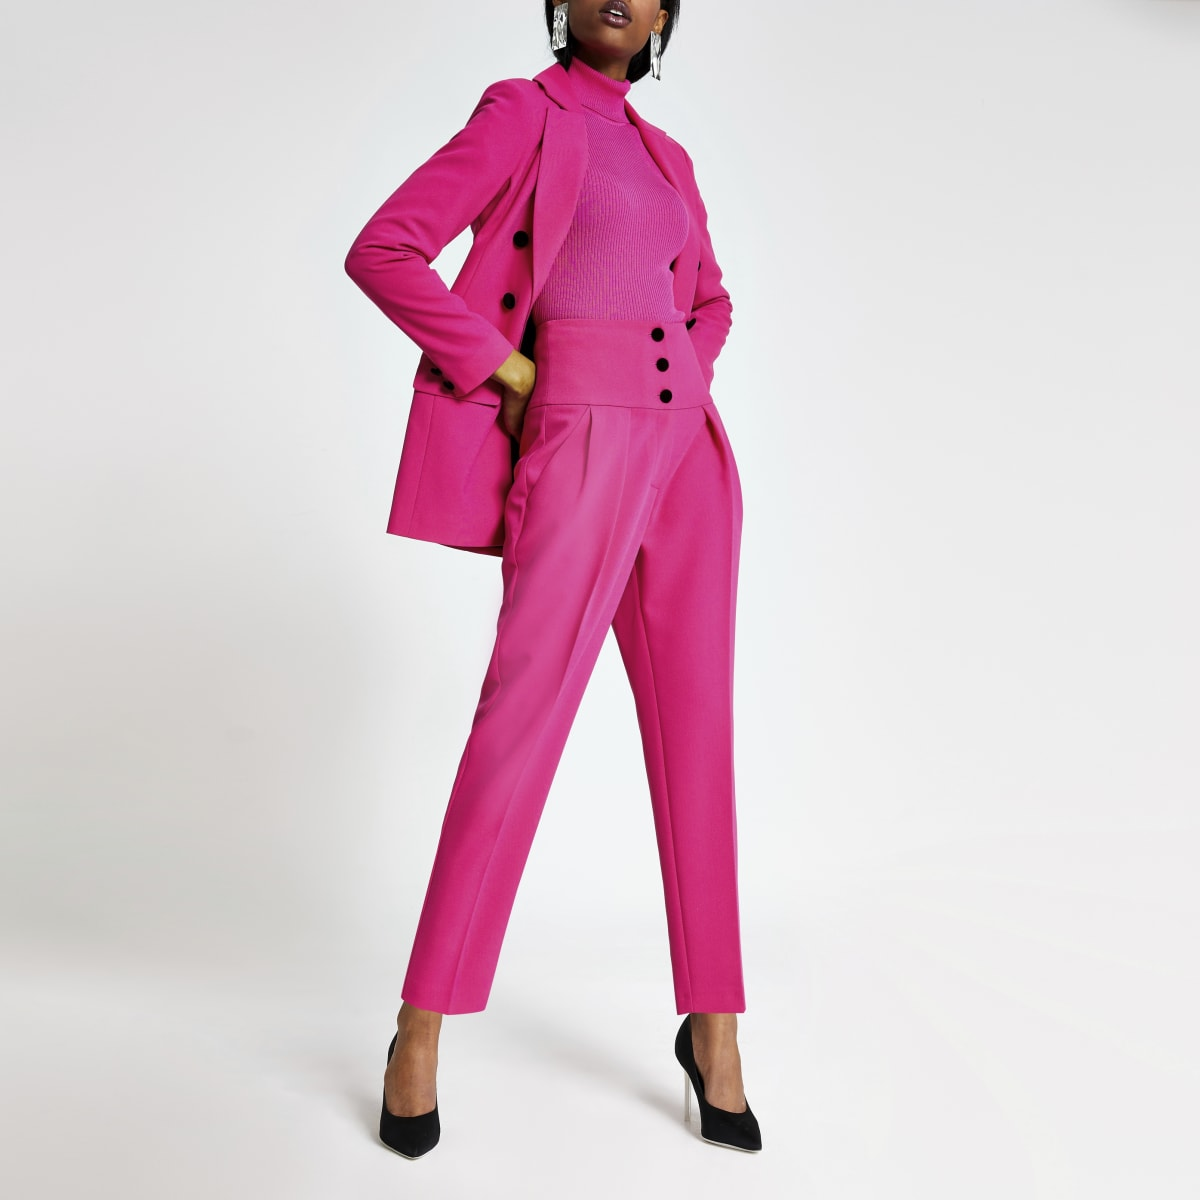 Pinkfarbene Zigarettenhose mit hohem Taillenkorsett